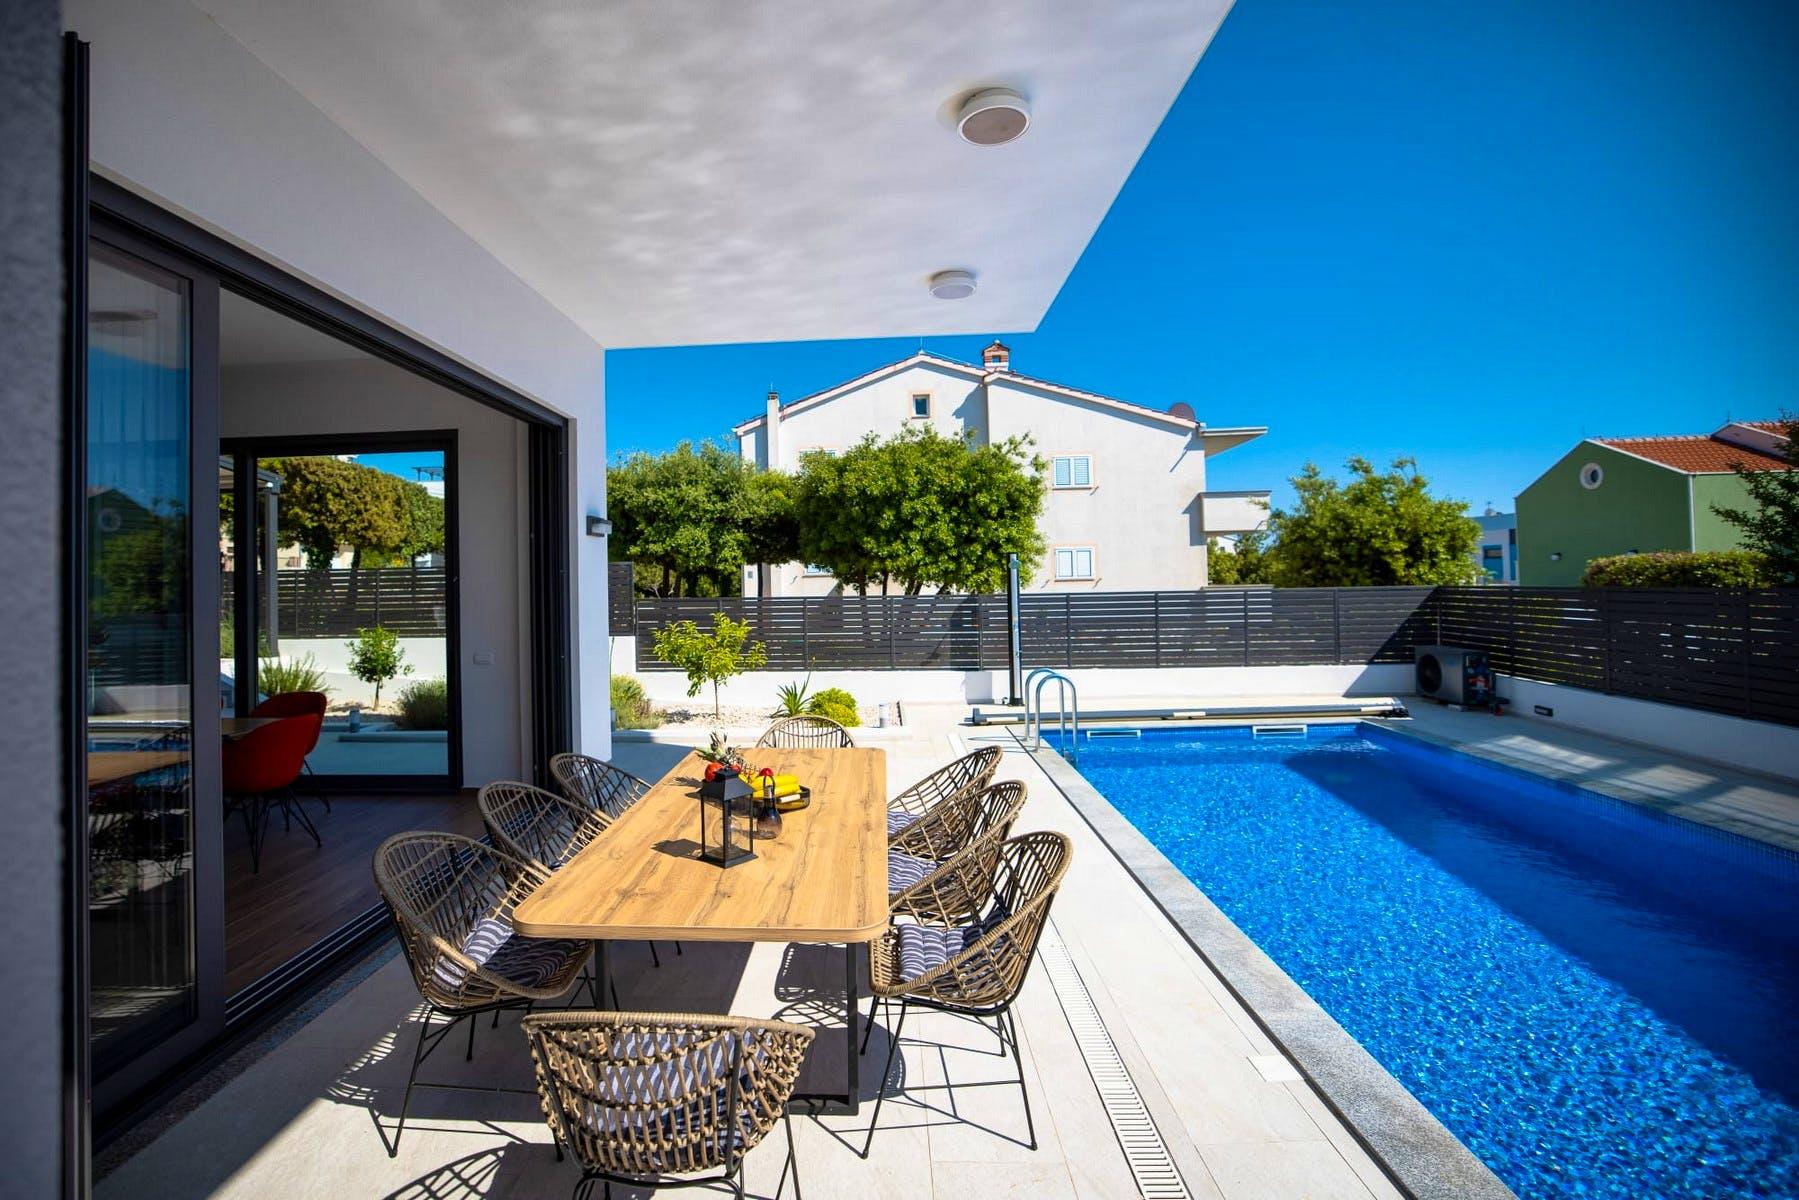 Contemporary villa with pool close to beach